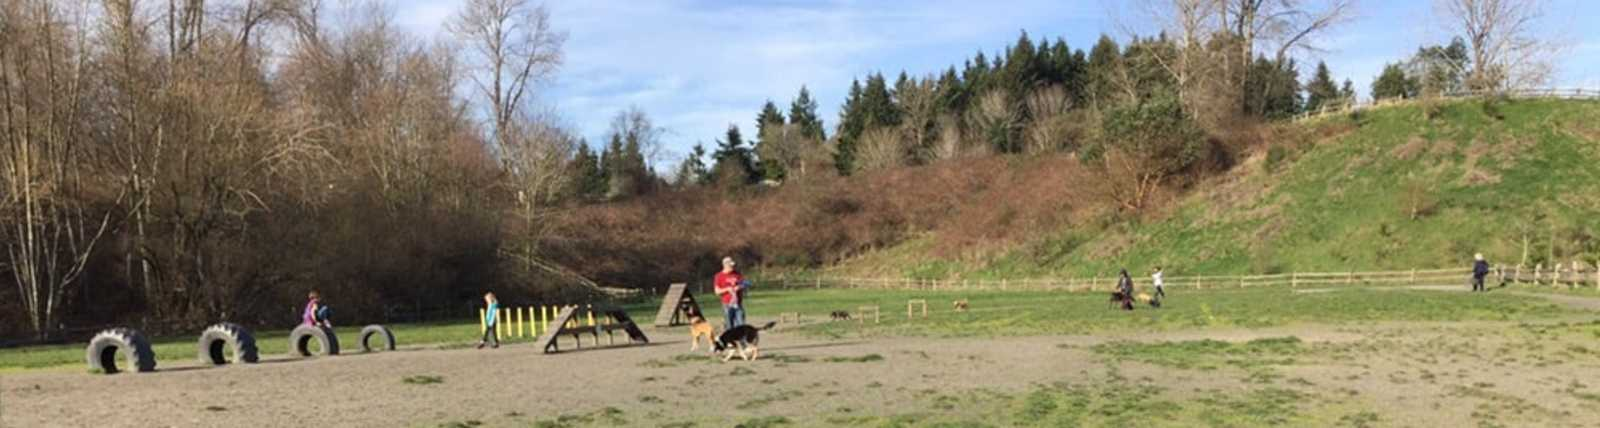 Grandview Off-Leash Dog Park